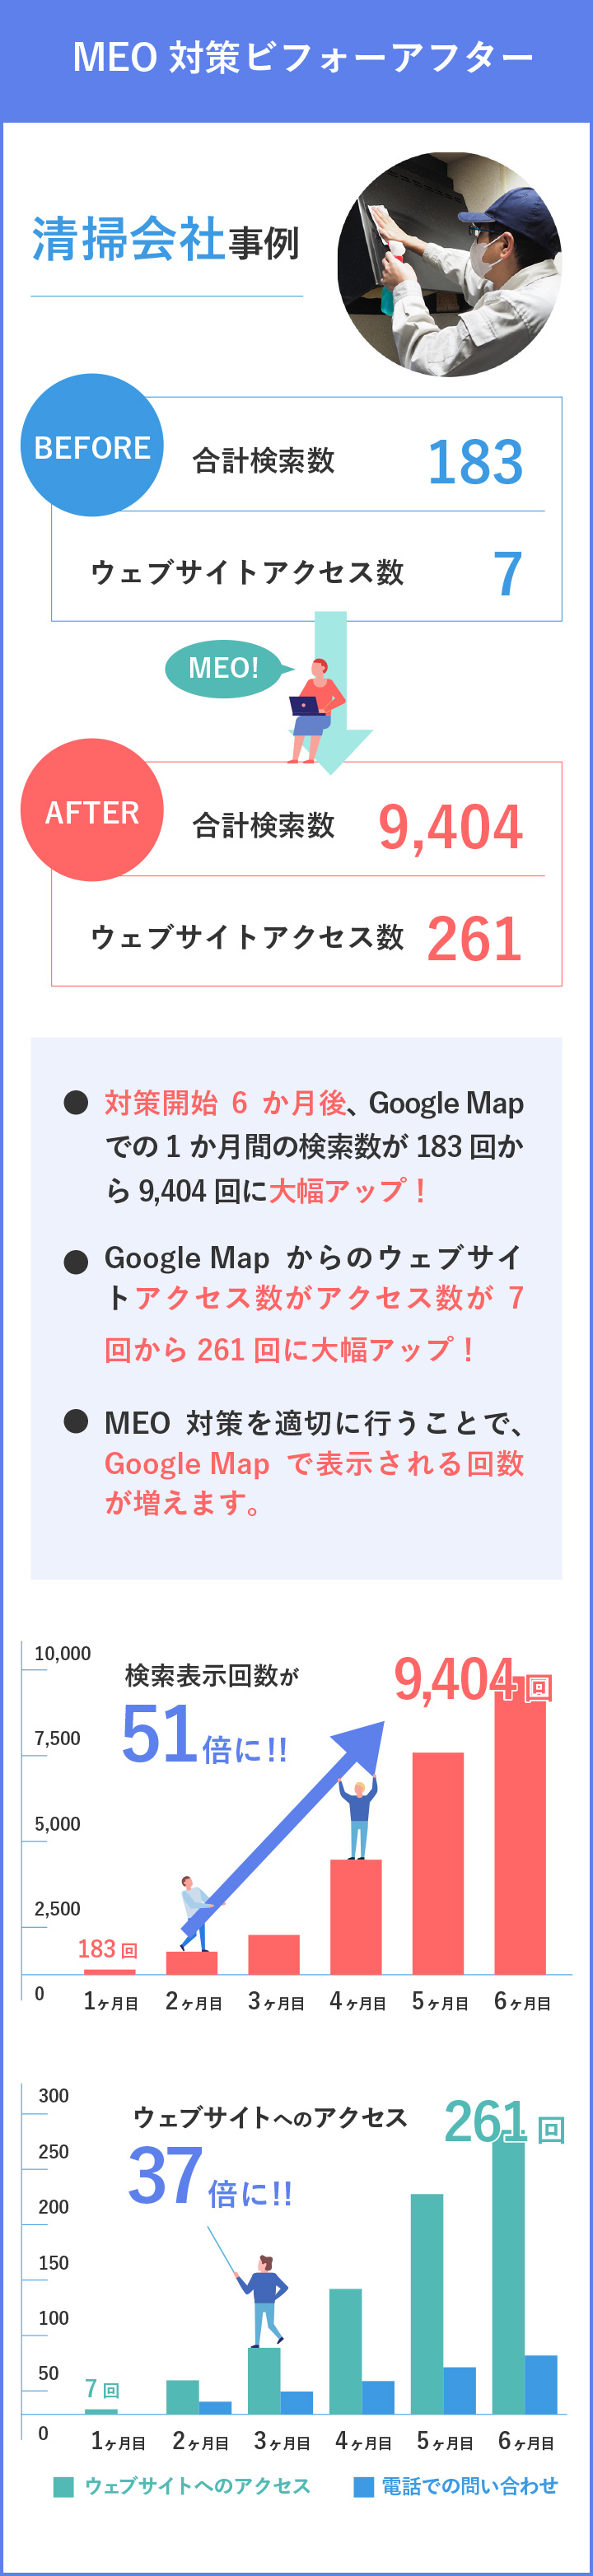 MEO対策でGoogleの地図の上位に表示